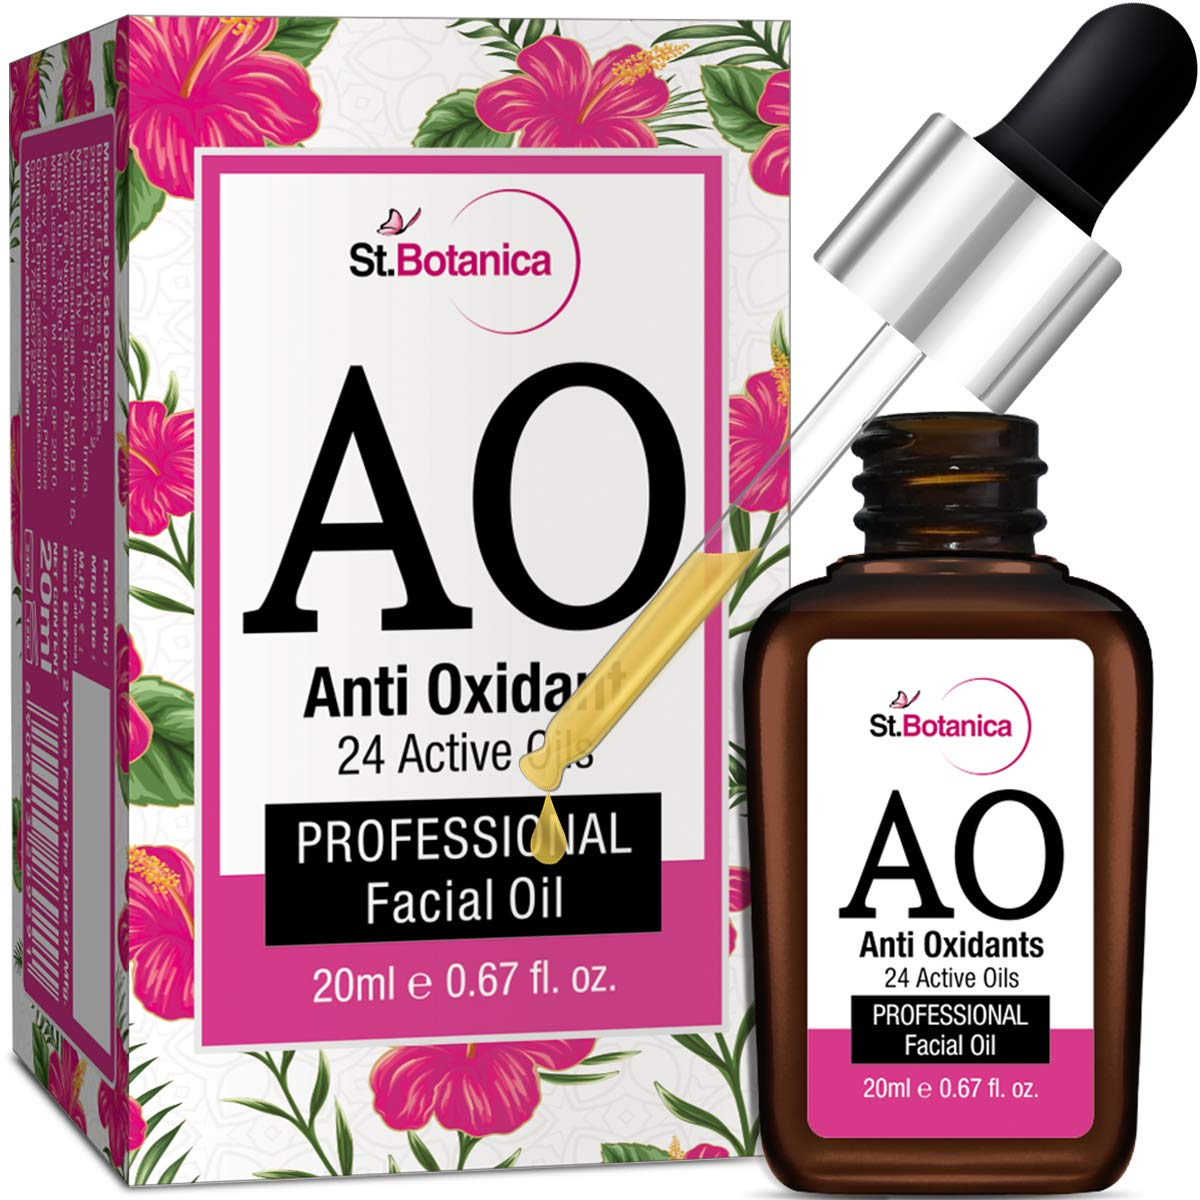 StBotanica Anti Oxidant (24 Active Oils) Professional Facial Oil - 20ml - Facial Glow, AntiAging with Retinol, Argan, Rosehip & Other Oils product image